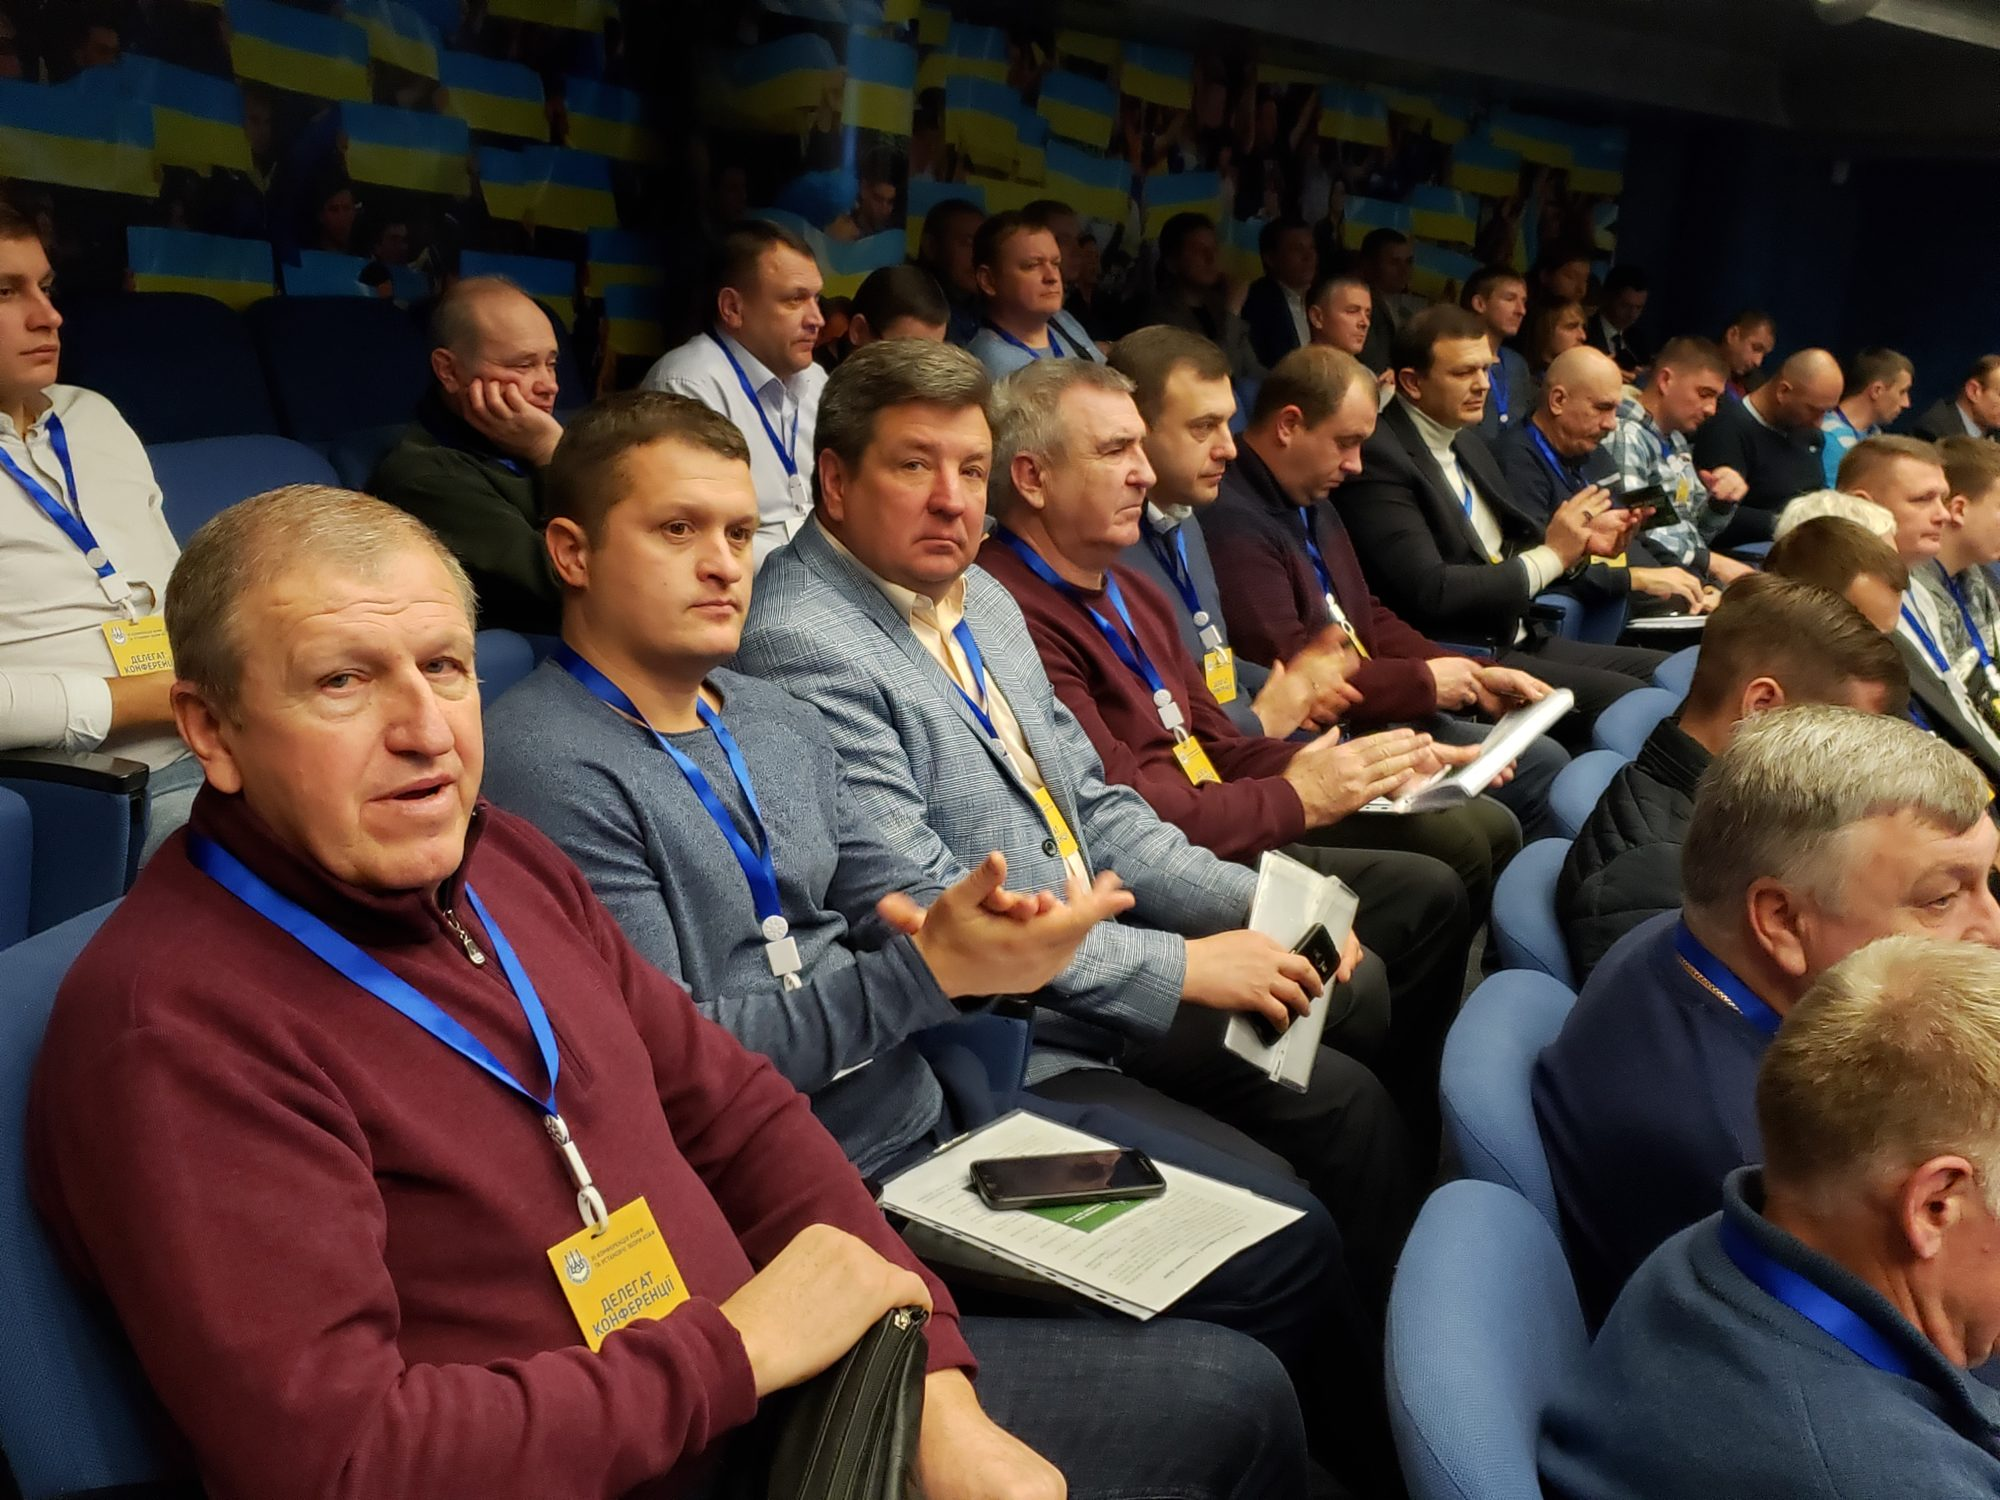 Обрано нового очільника Київщини футбольної -  - 20200118 104750 2000x1500